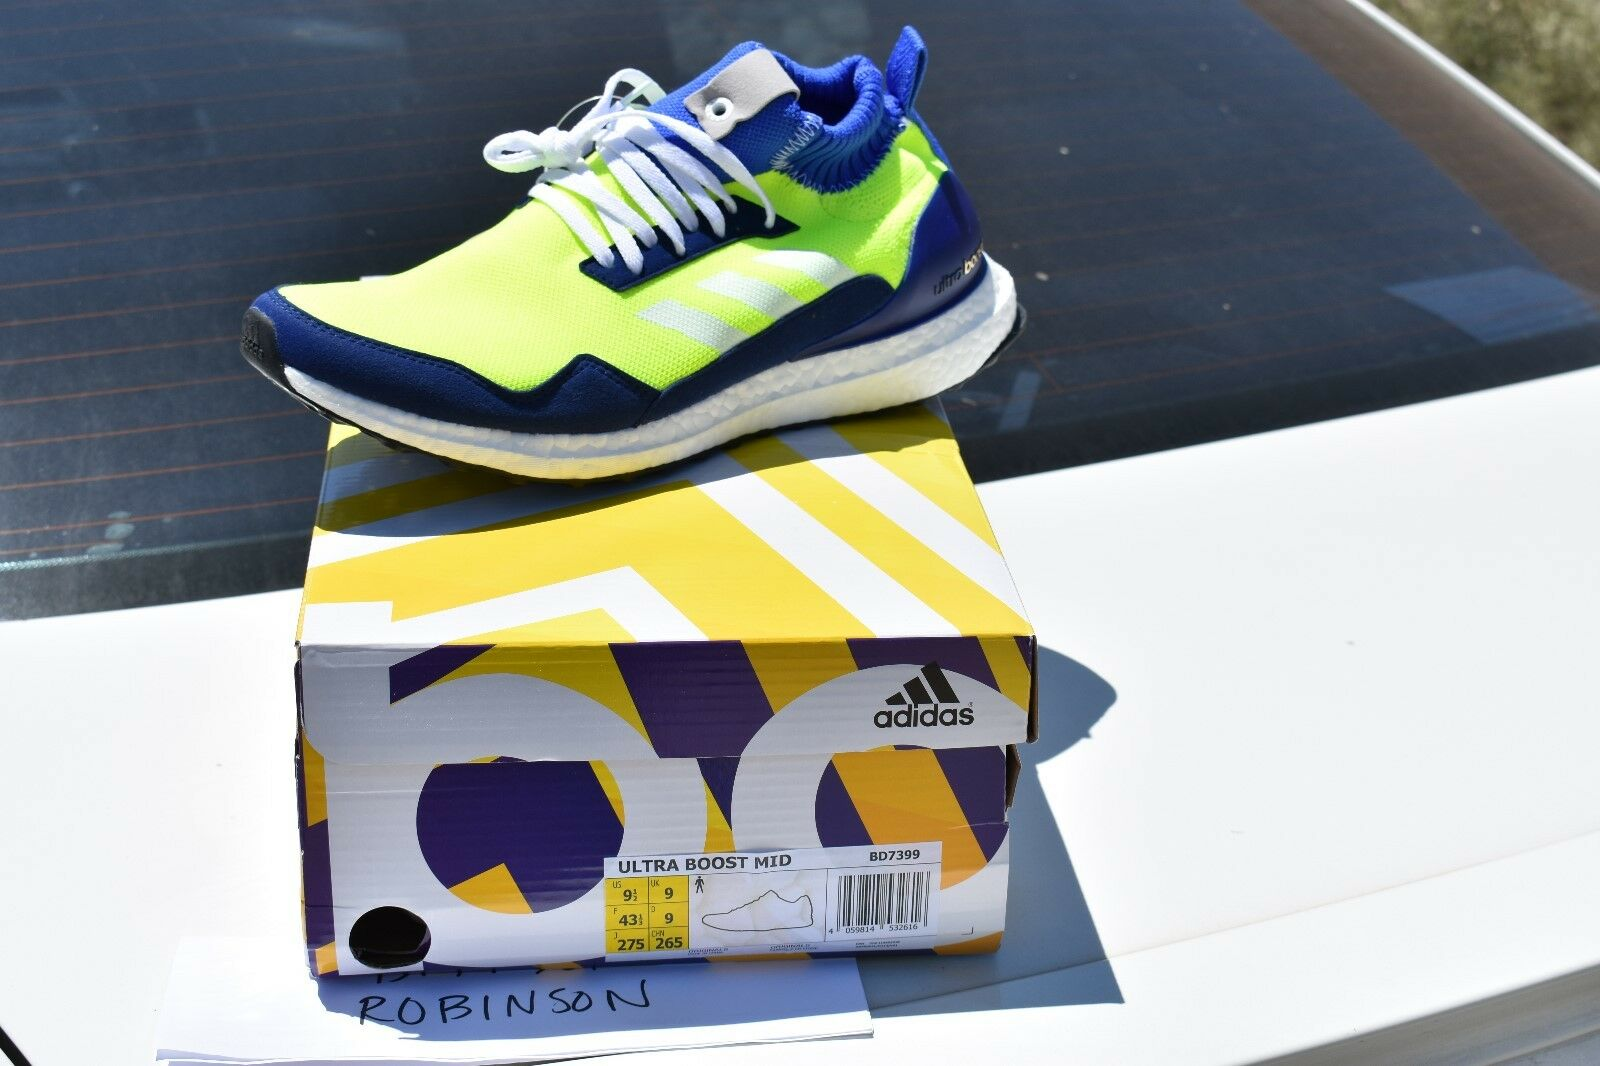 e6fdf781fb9bb Adidas Ultra Boost Mid Predotype sz 9.5 BD7399 pharrell hu nmd yeezy clima